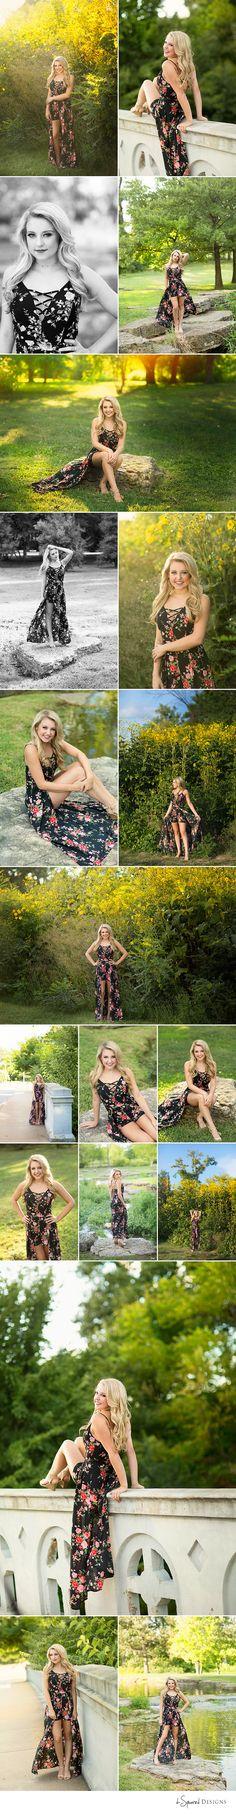 Emma   St. Louis, MO Senior Photography   dsqdesigns.com